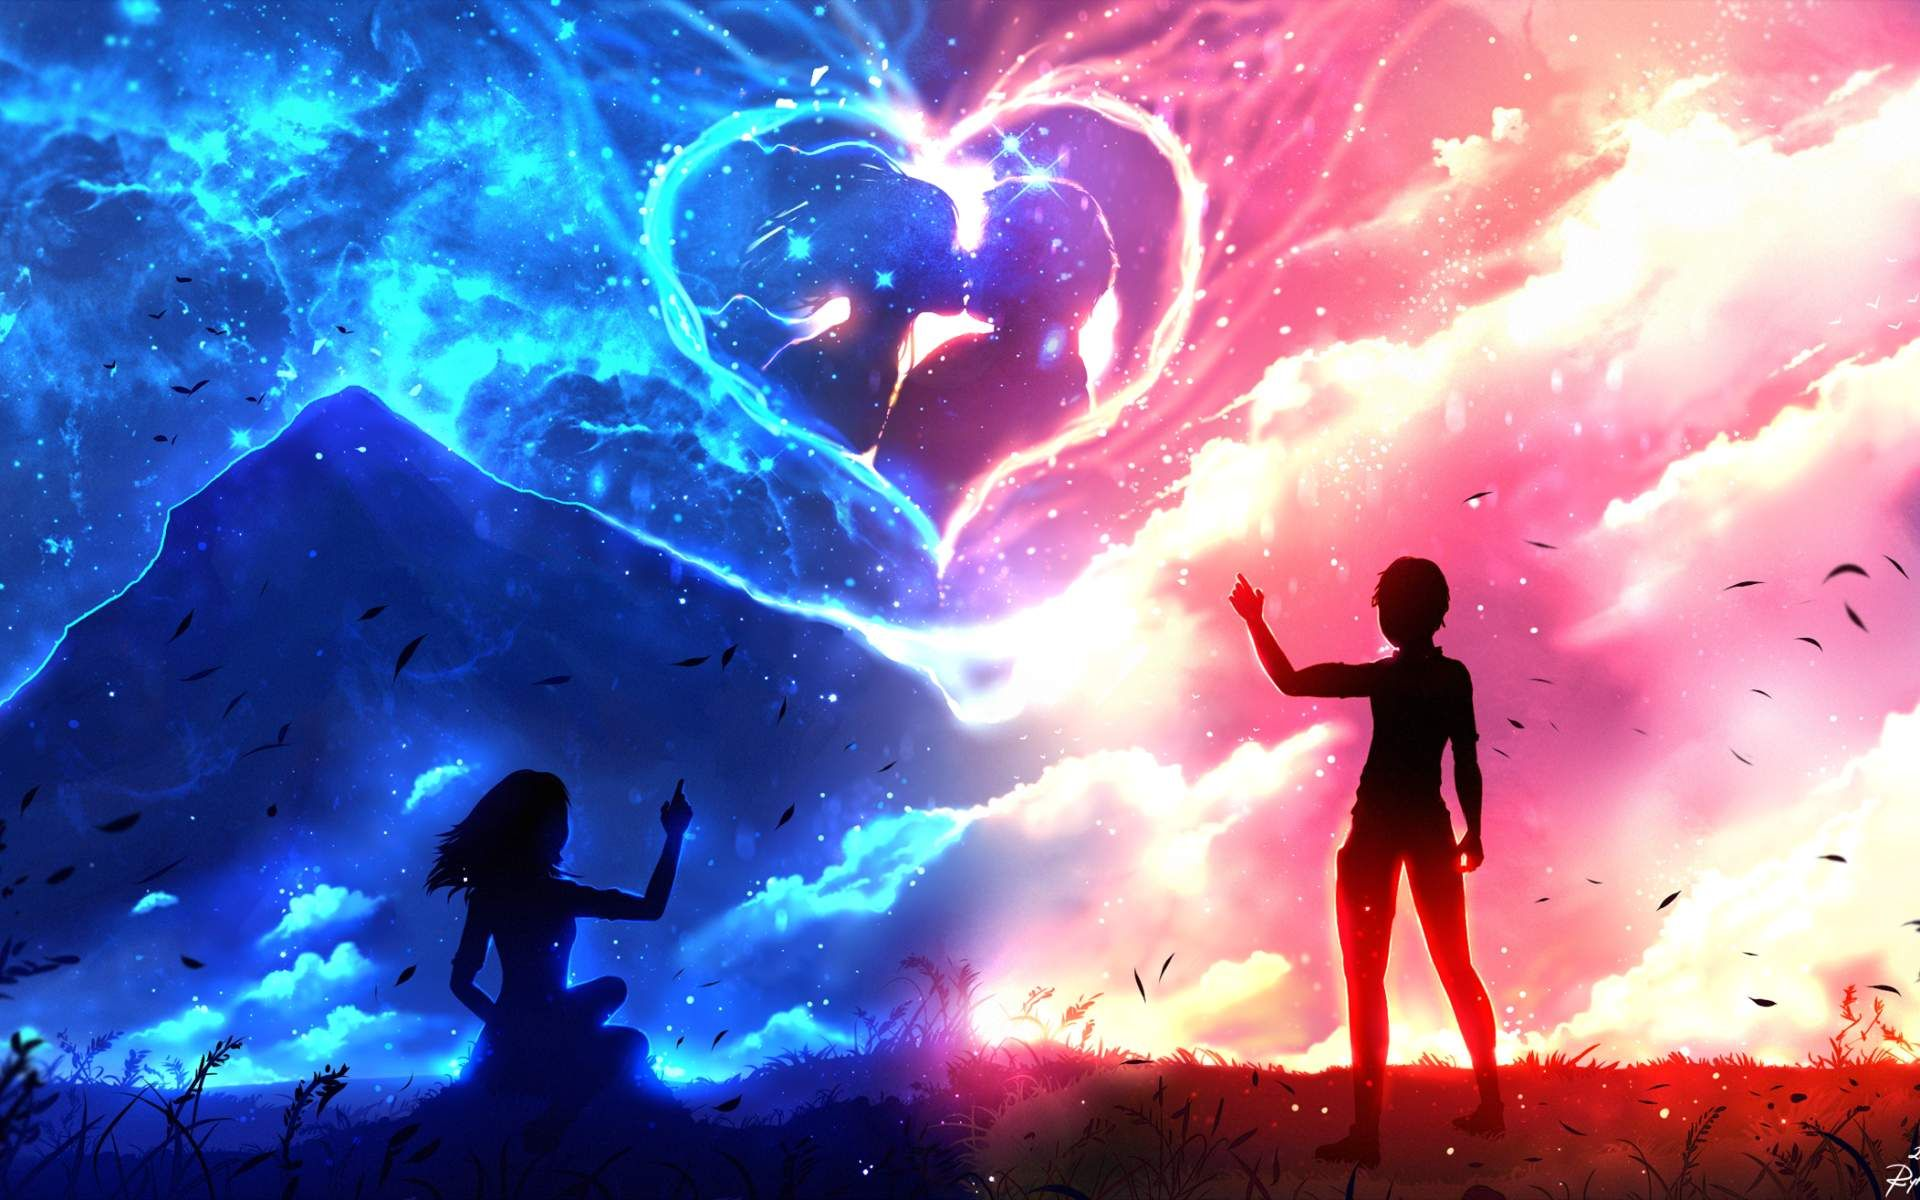 Fantastic Wallpaper I Love You Cartoon - ac3b4169584fa1b9dee0e22254f83e67  2018_24513   .jpg